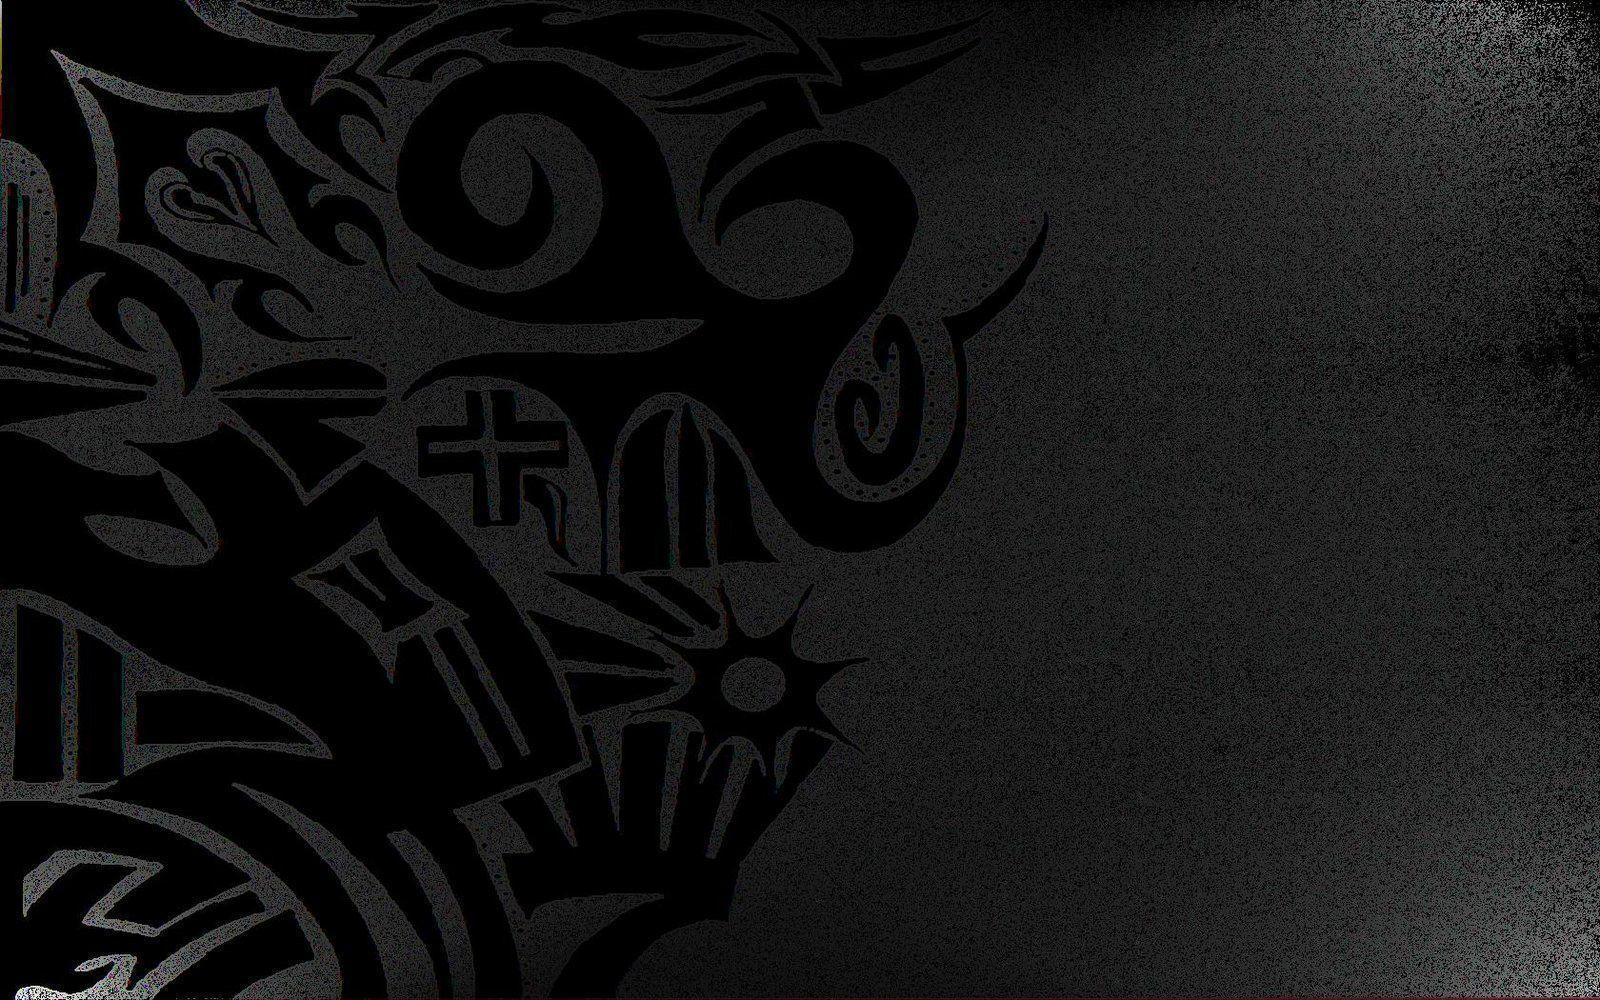 DeviantArt More Like Tribal Dragon Psp Wallpaper By HalfOfZero